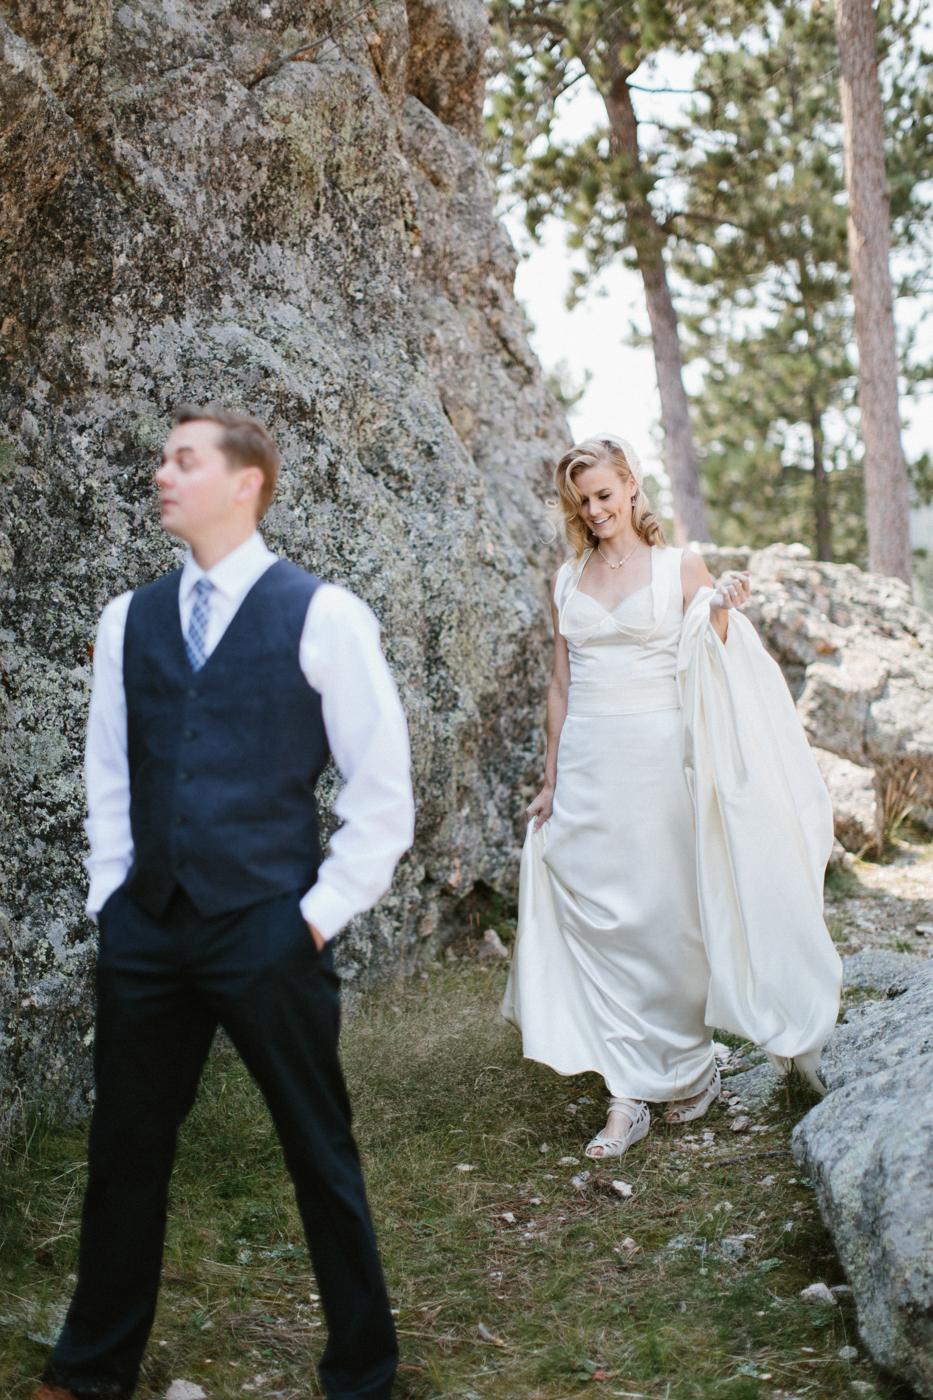 SouthDakota-Iowa-Destination-Wedding-Photographer_023.jpg